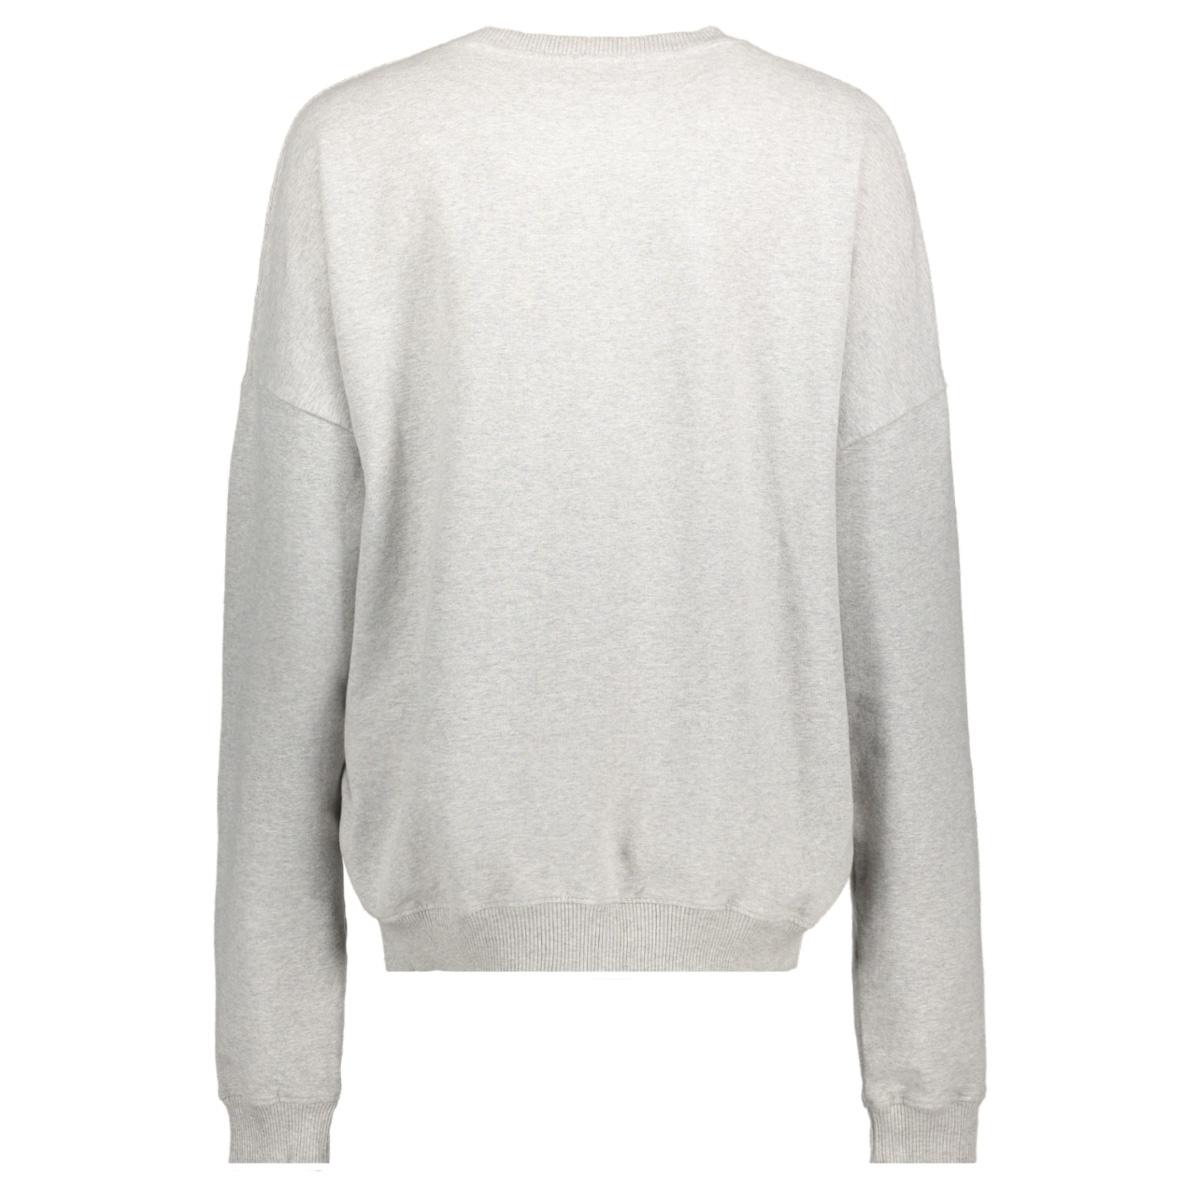 208108103 10 days sweater light grey melee